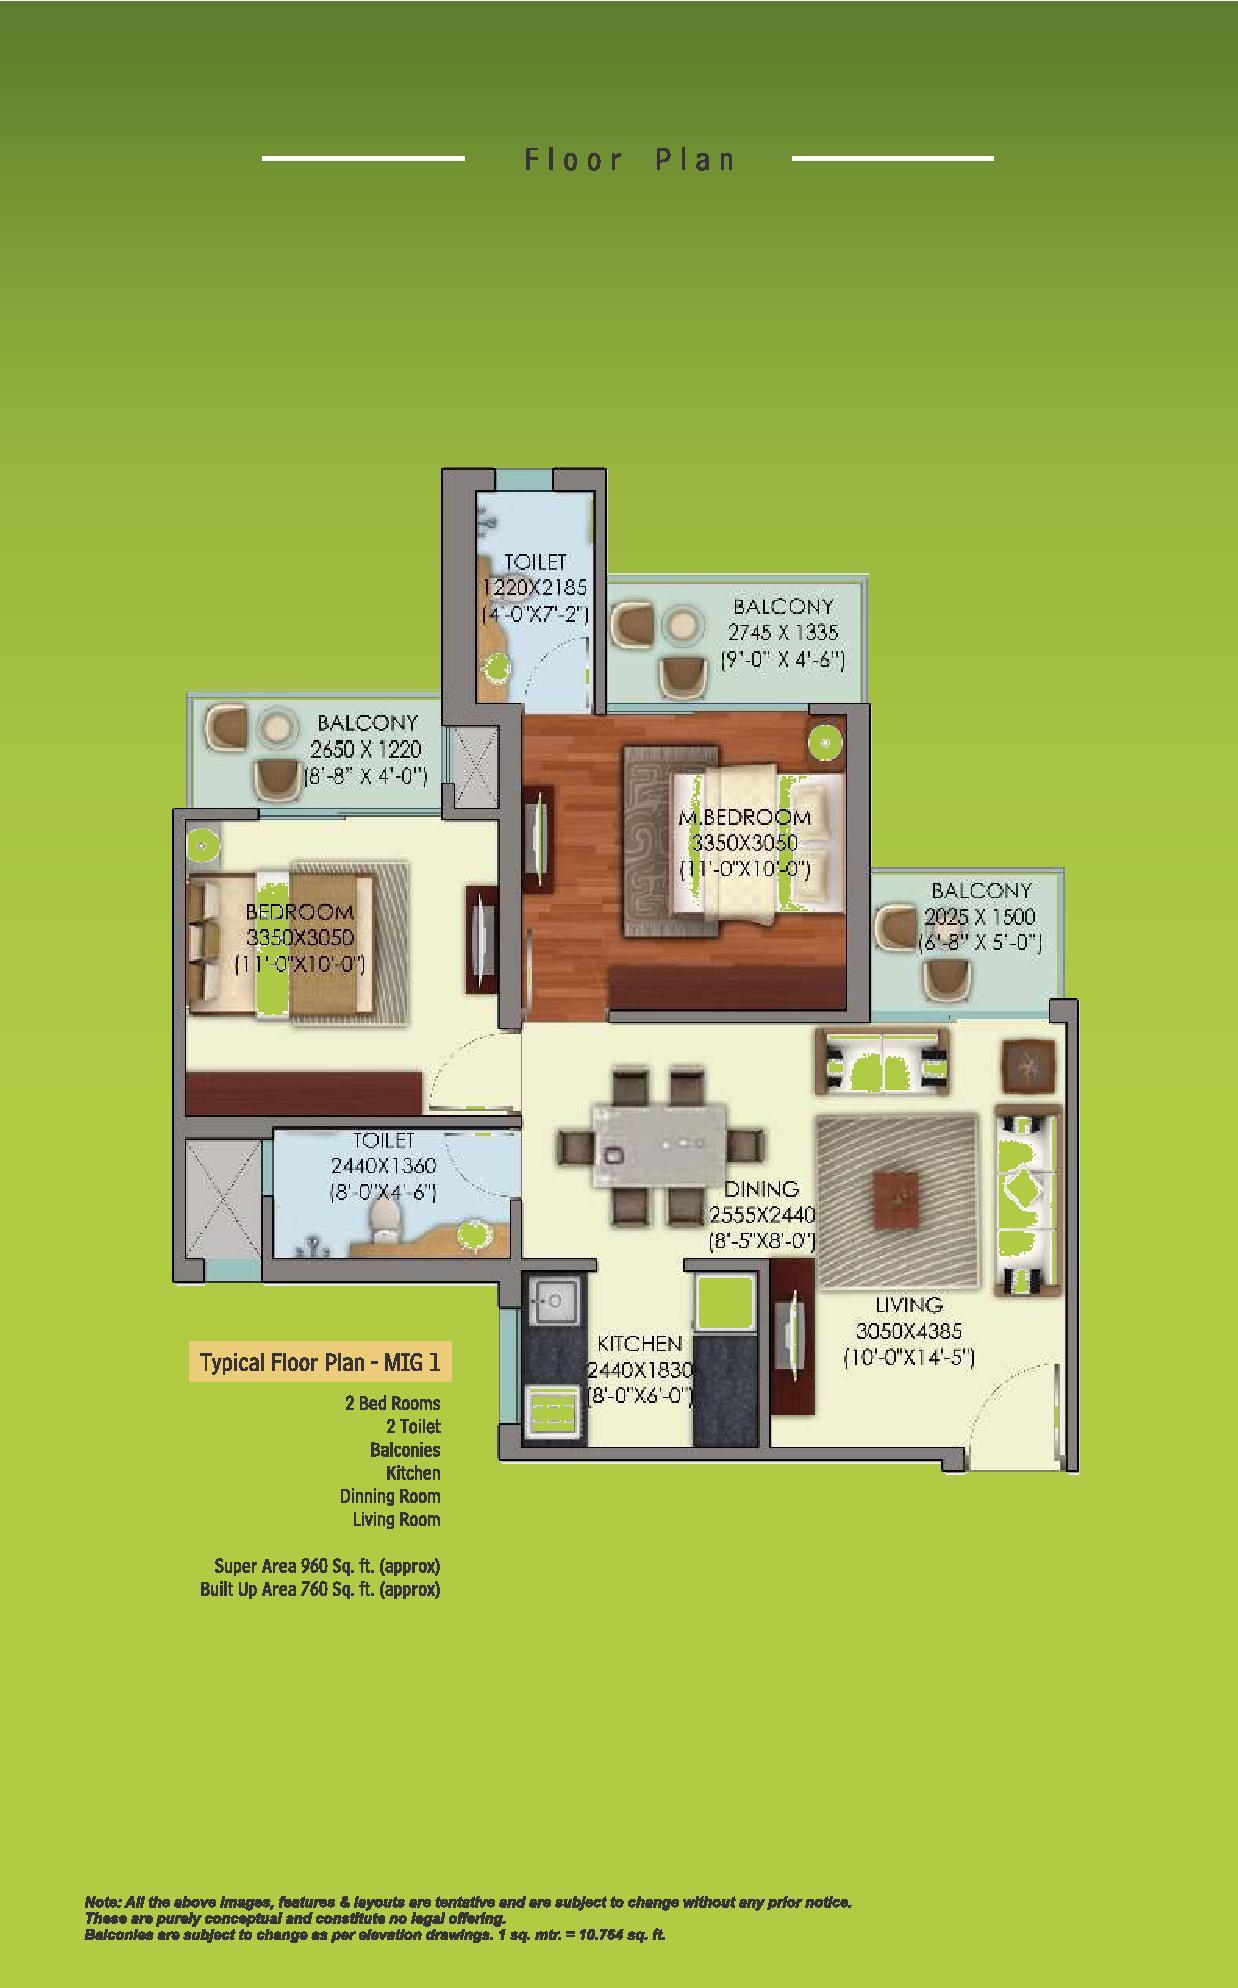 Mahagun Mywoods Phase III Floor Plan